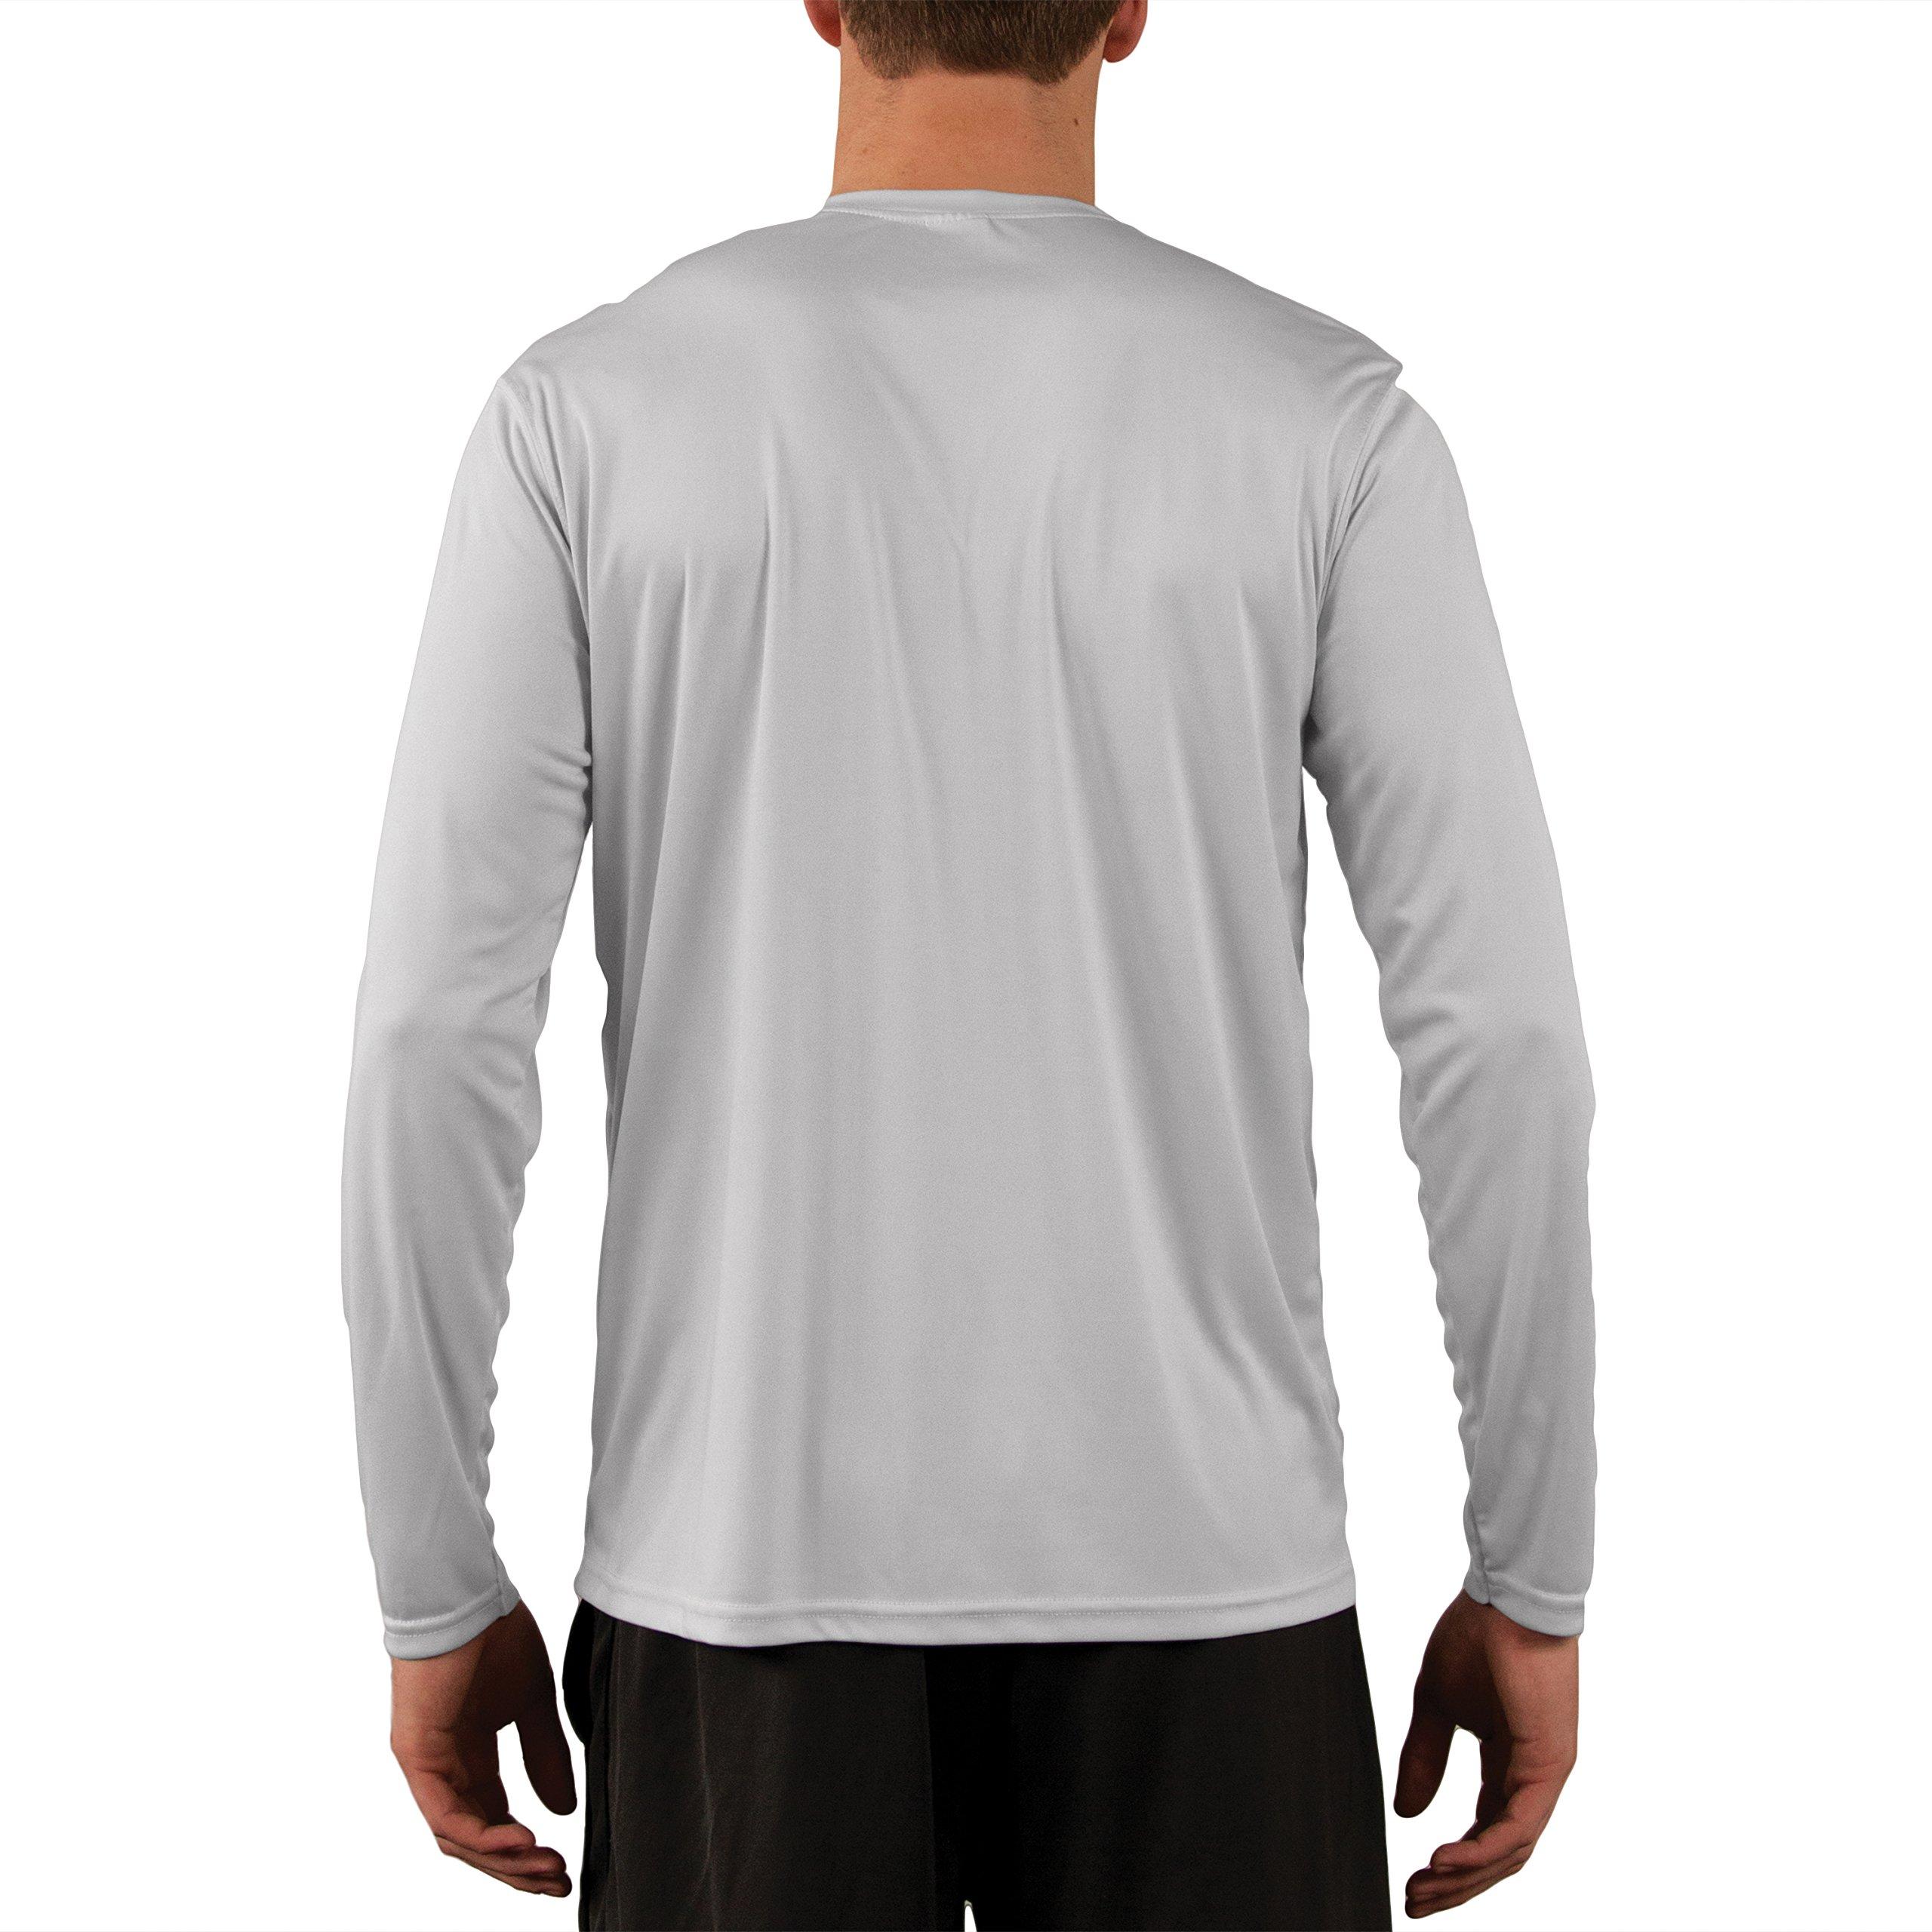 Vapor Apparel Men's UPF 50+ UV Sun Protection Performance Long Sleeve T-Shirt X-Large Pearl Grey by Vapor Apparel (Image #2)